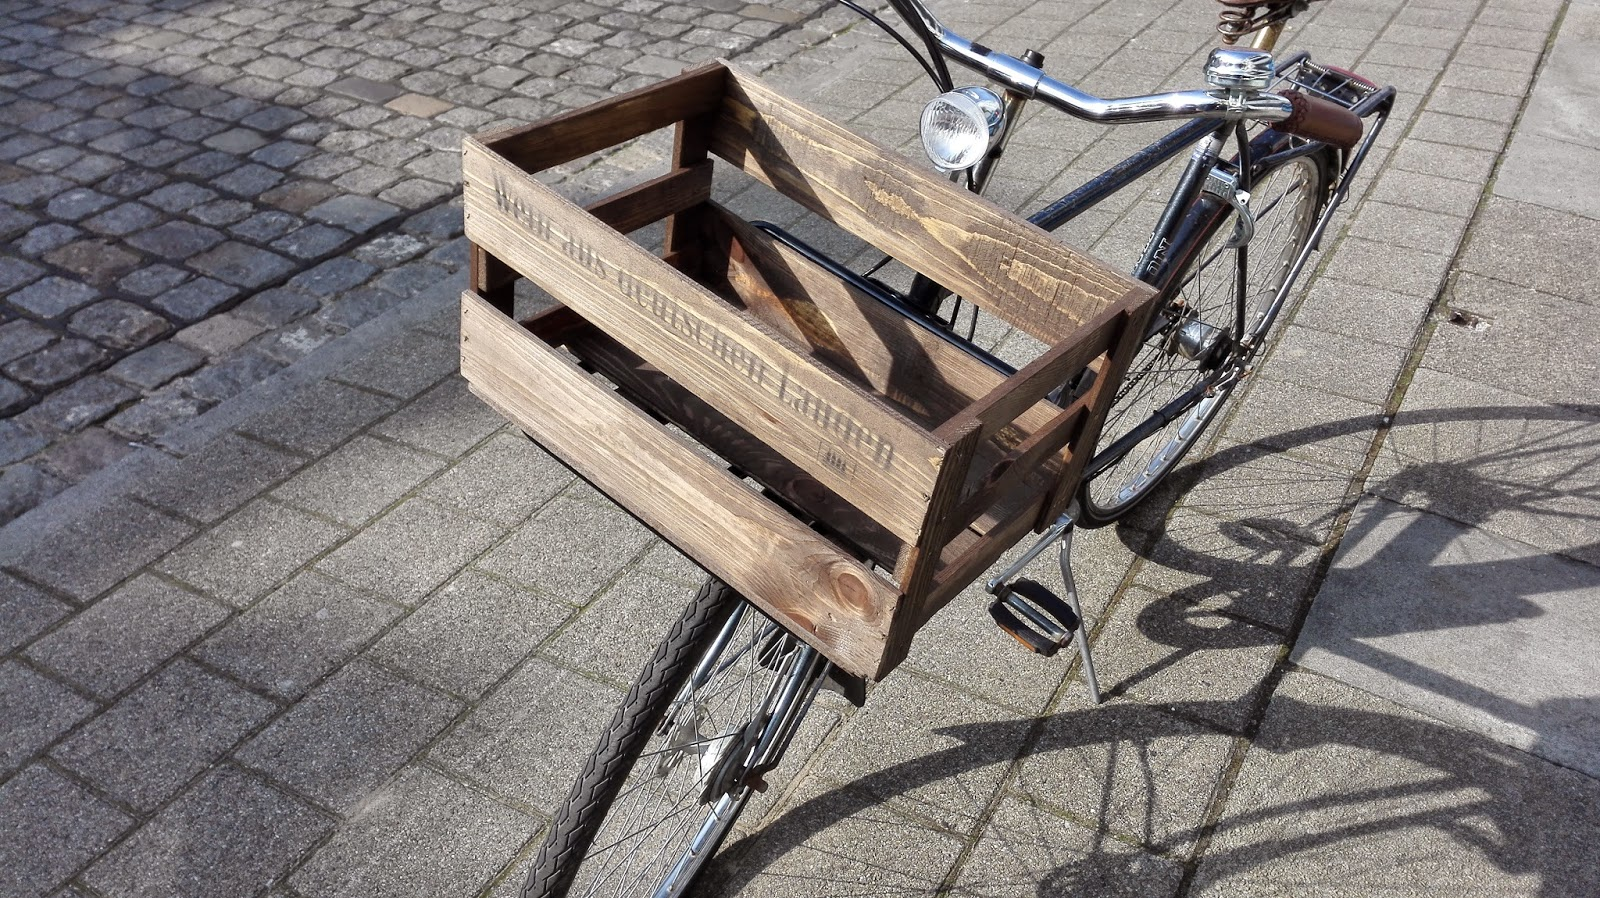 diy shabby weinkiste mit fahrrad front gep cktr ger so geht 39 s. Black Bedroom Furniture Sets. Home Design Ideas